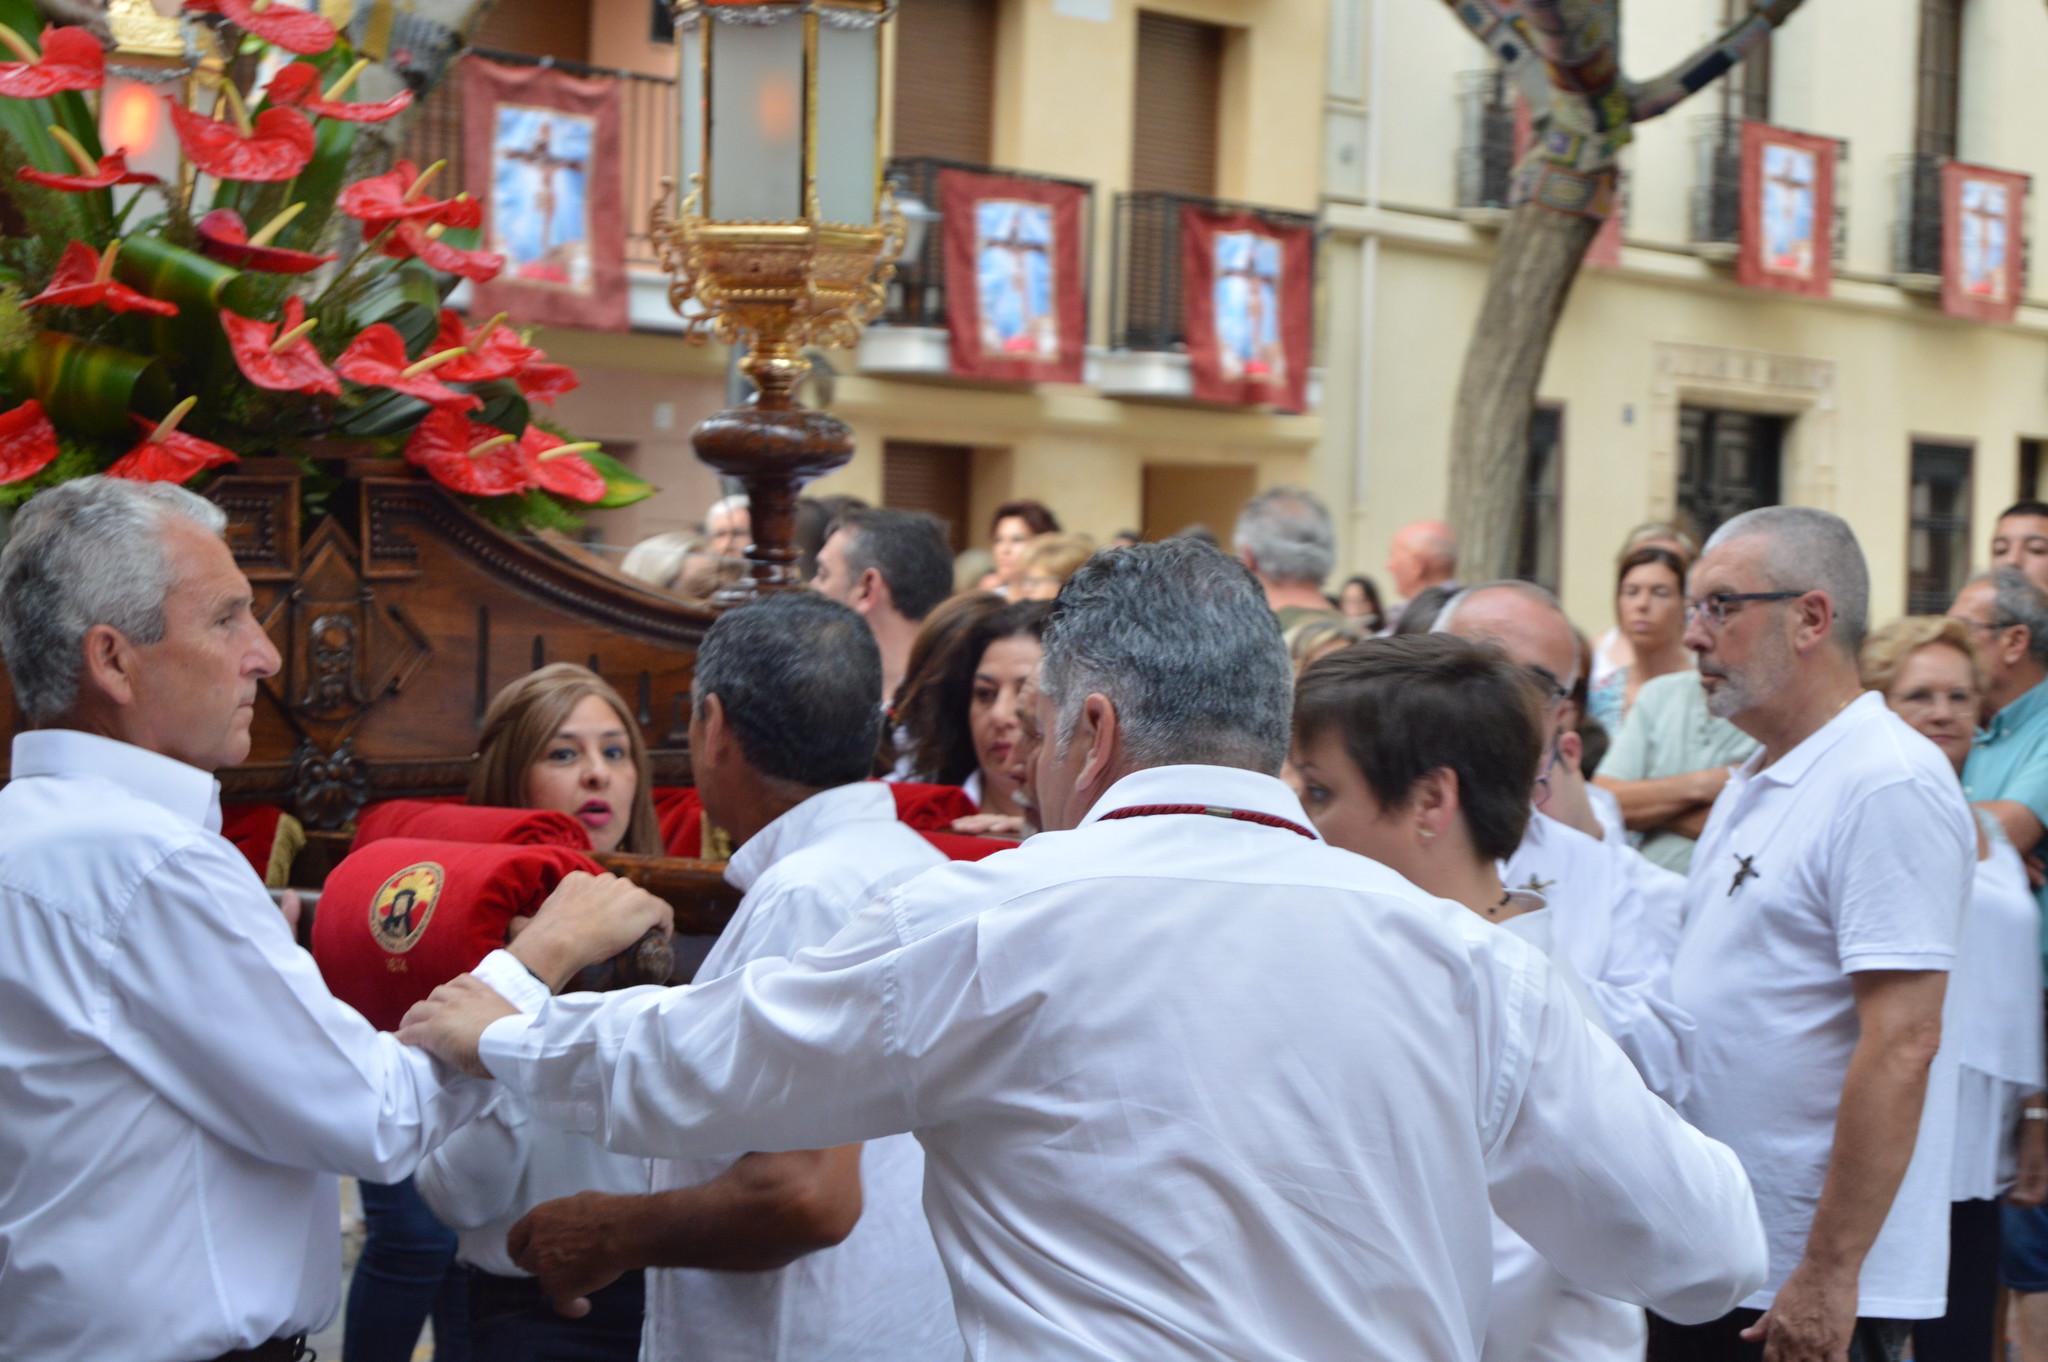 (2019-07-07) Procesión de subida - Adrián Romero Montesinos (08)